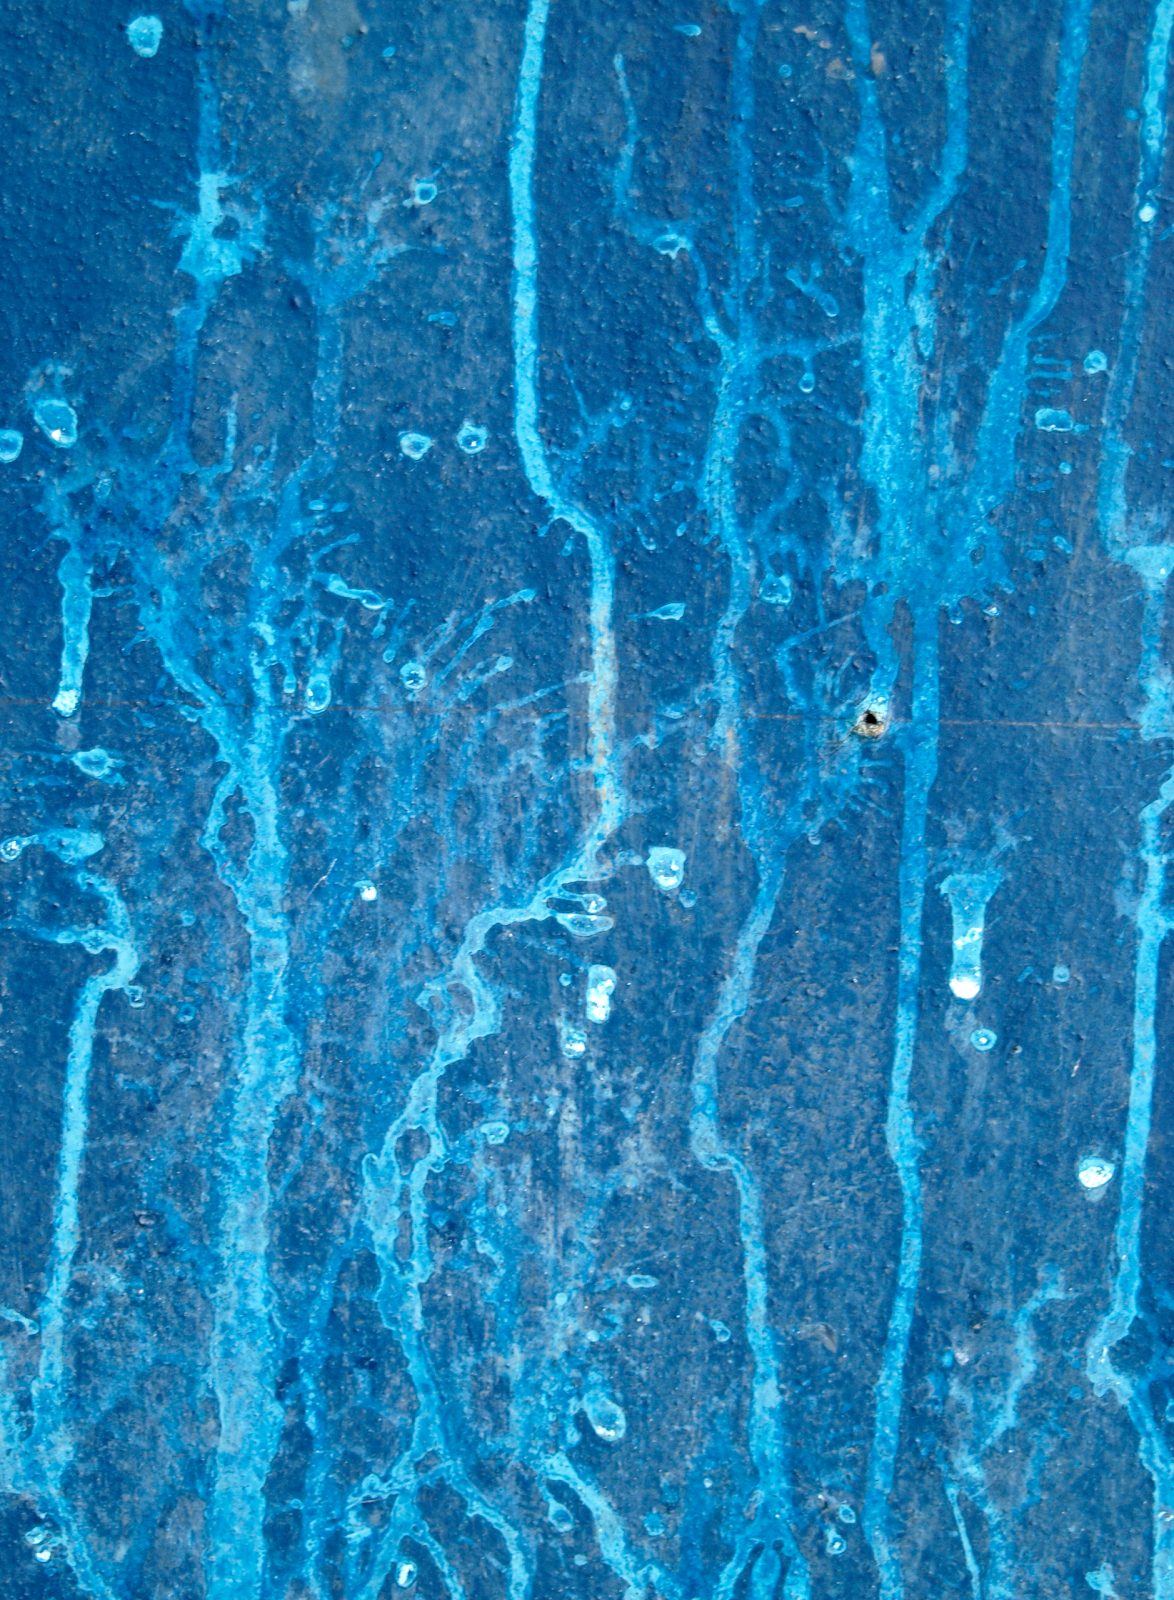 Wallpaper Over Textured Walls Download Wallpaper DaWallpaperz 1174x1600